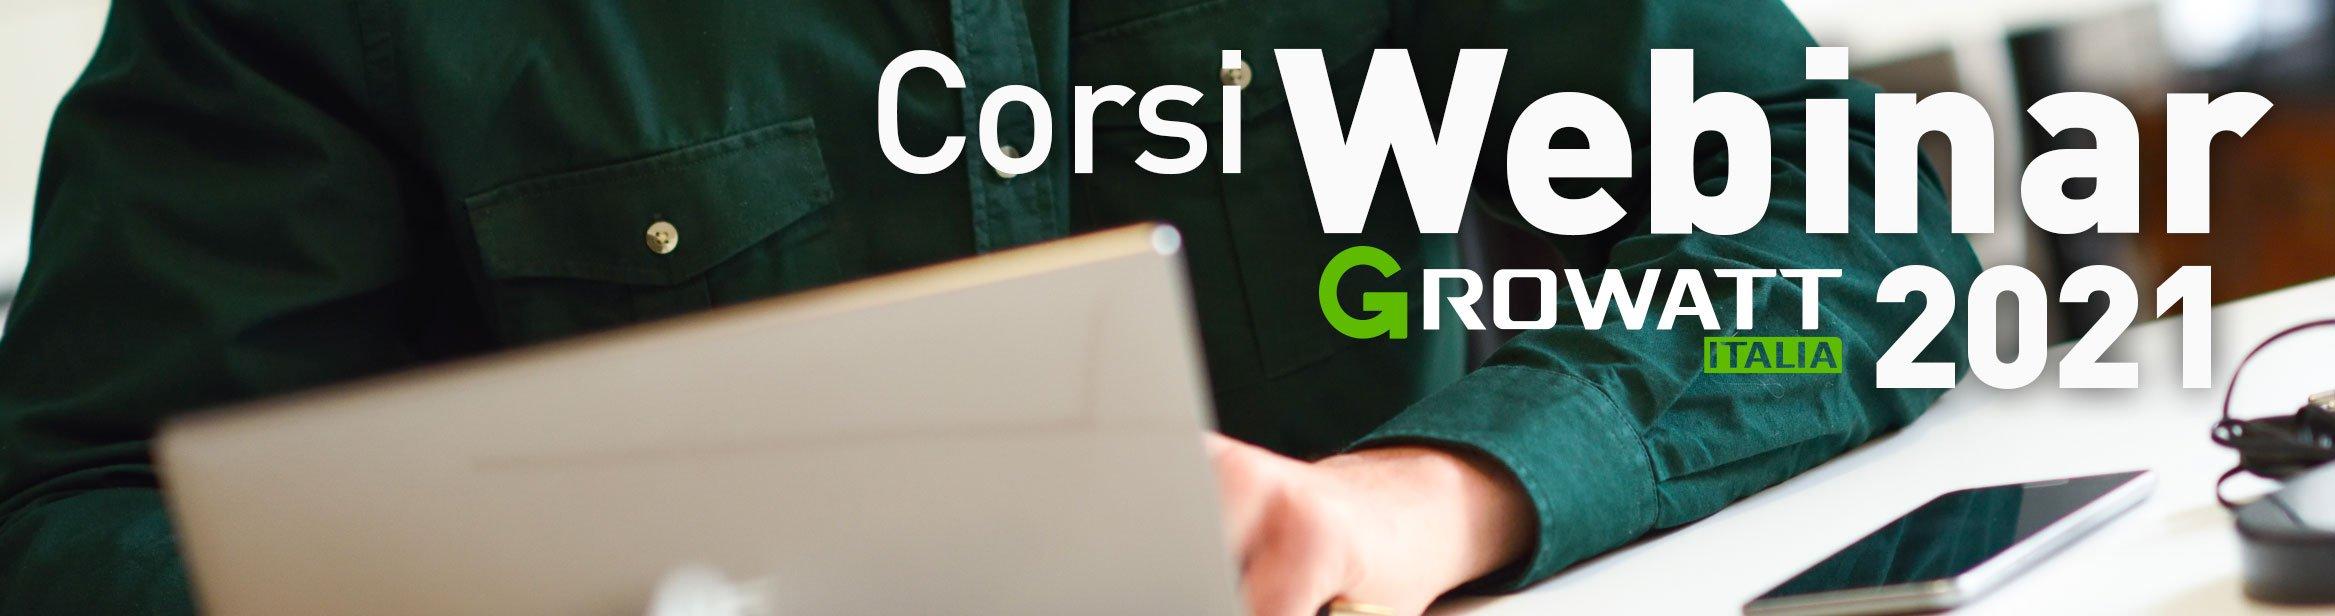 Slide-Pagine-interne-Growatt-Corsi-WEBINAR-2021